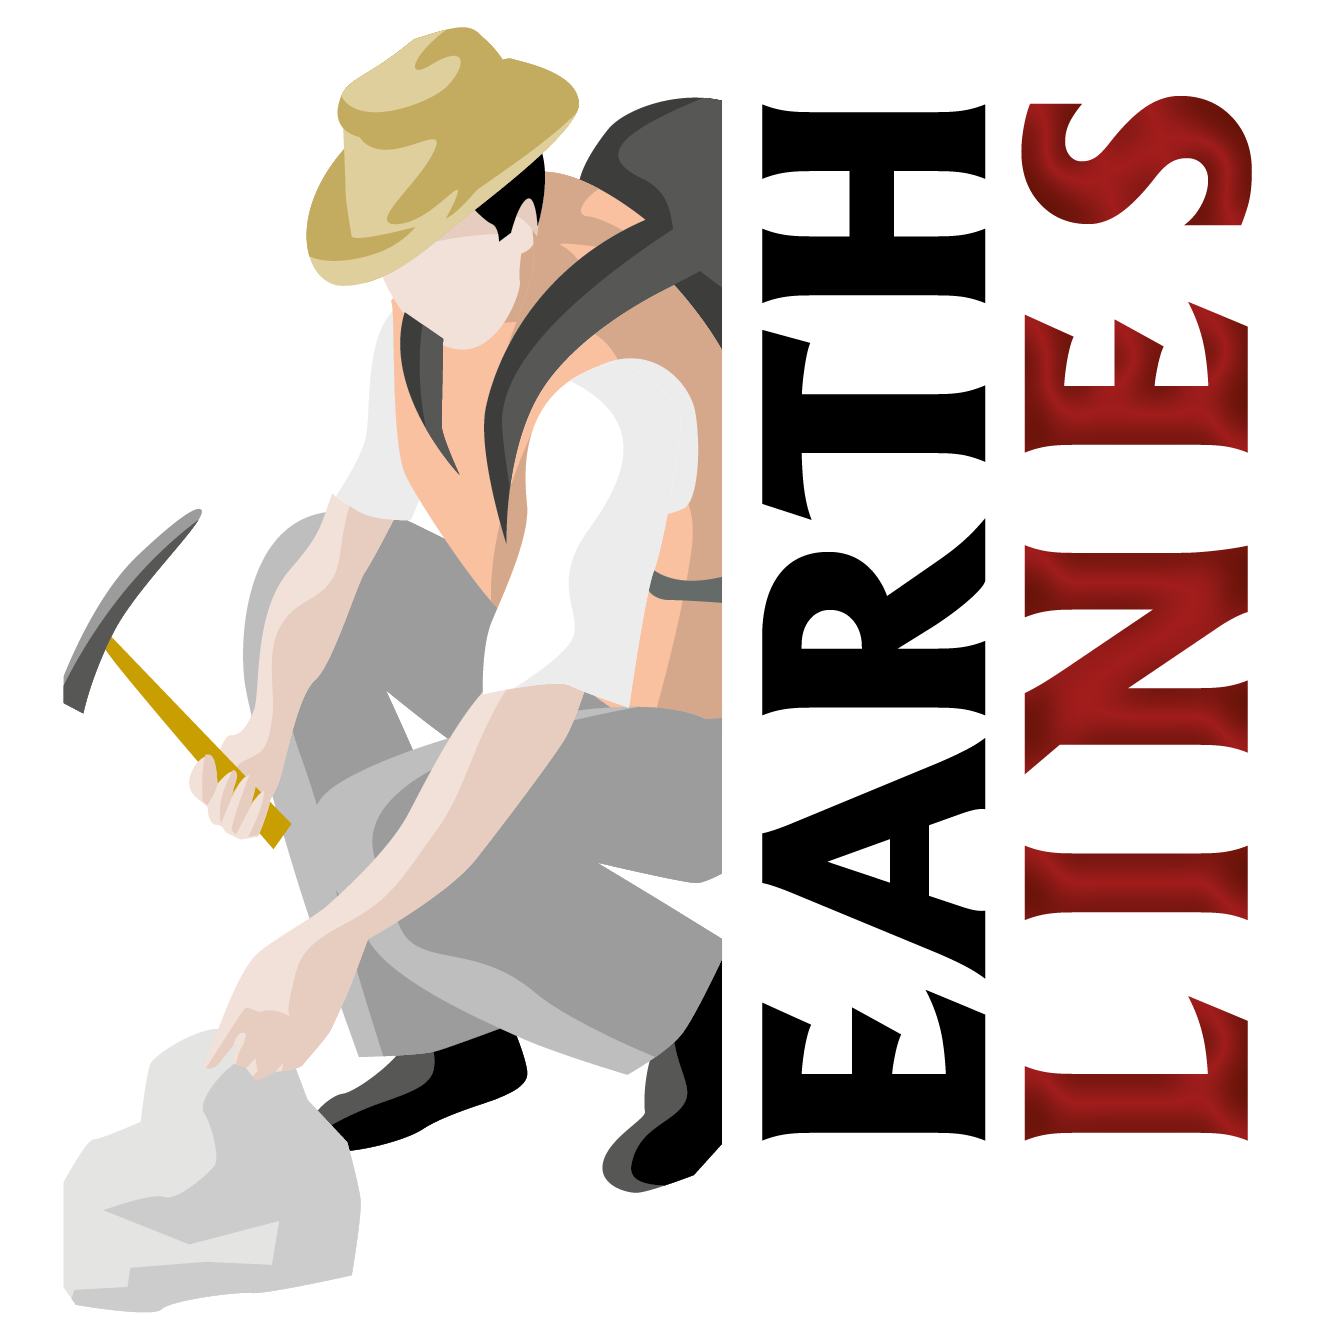 Earthlines